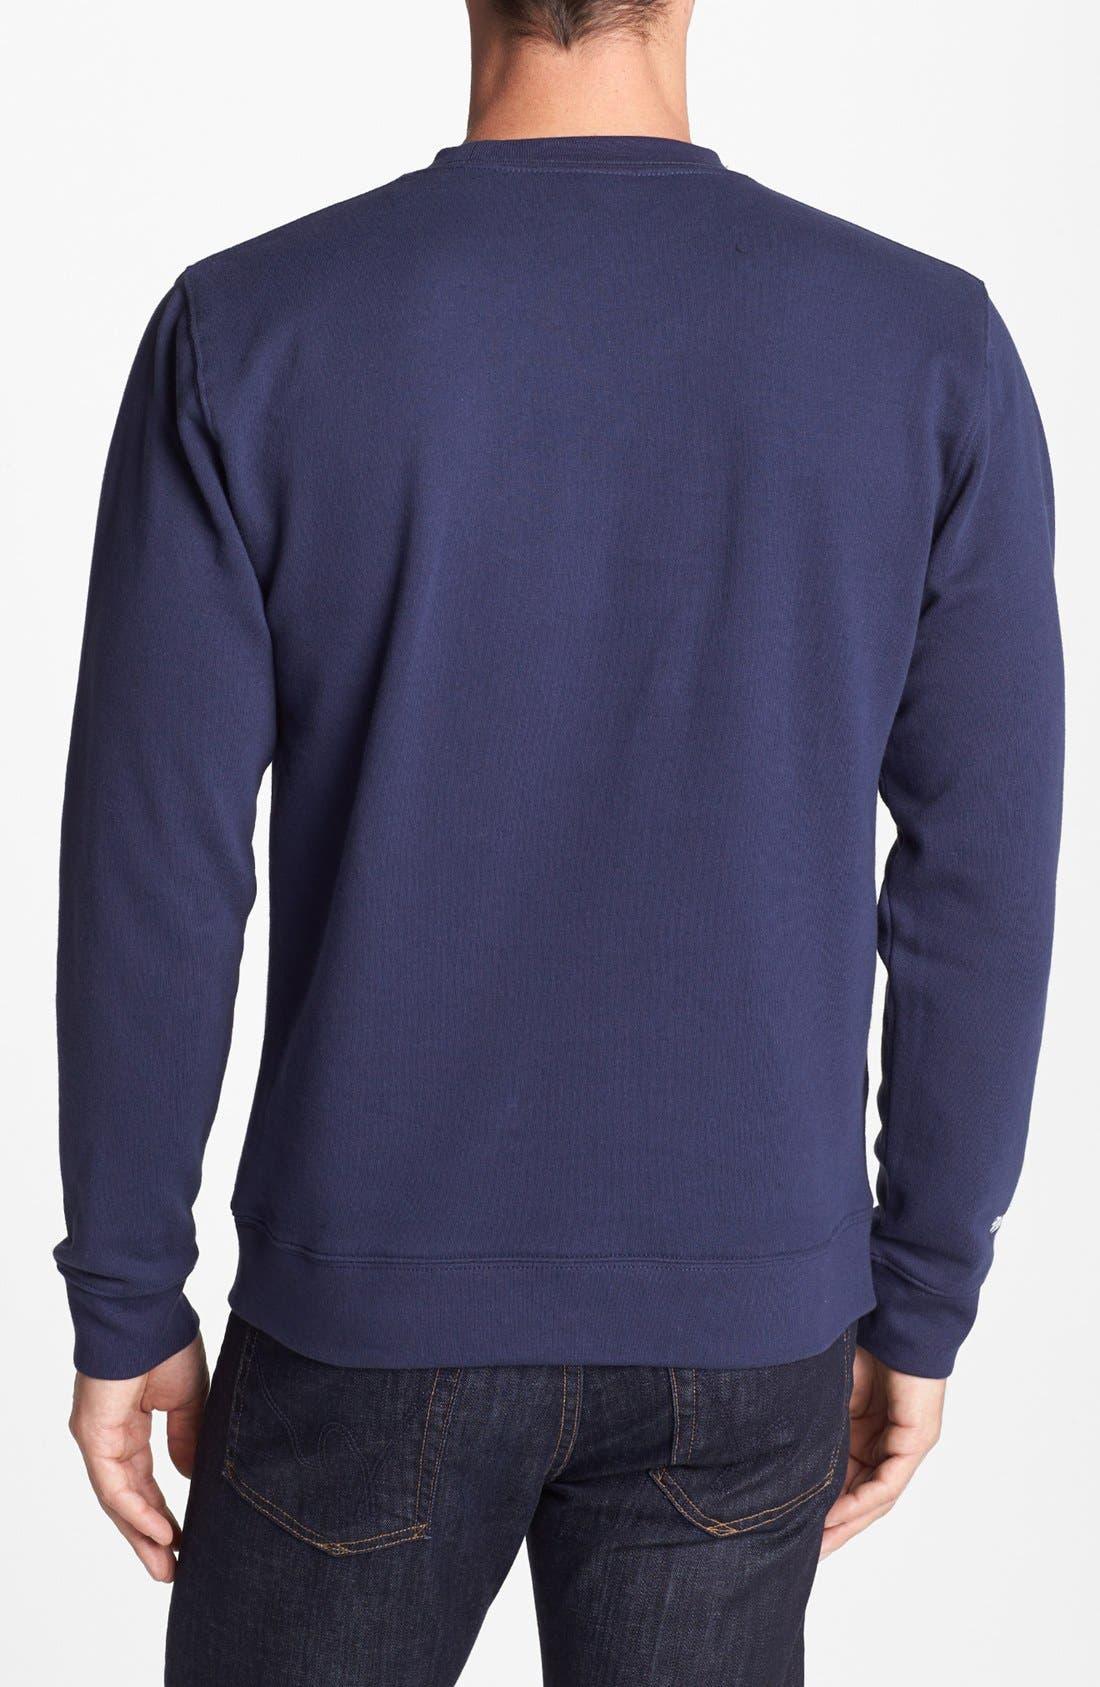 Alternate Image 2  - Mitchell & Ness 'Indiana Pacers - Technical Foul' Sweatshirt